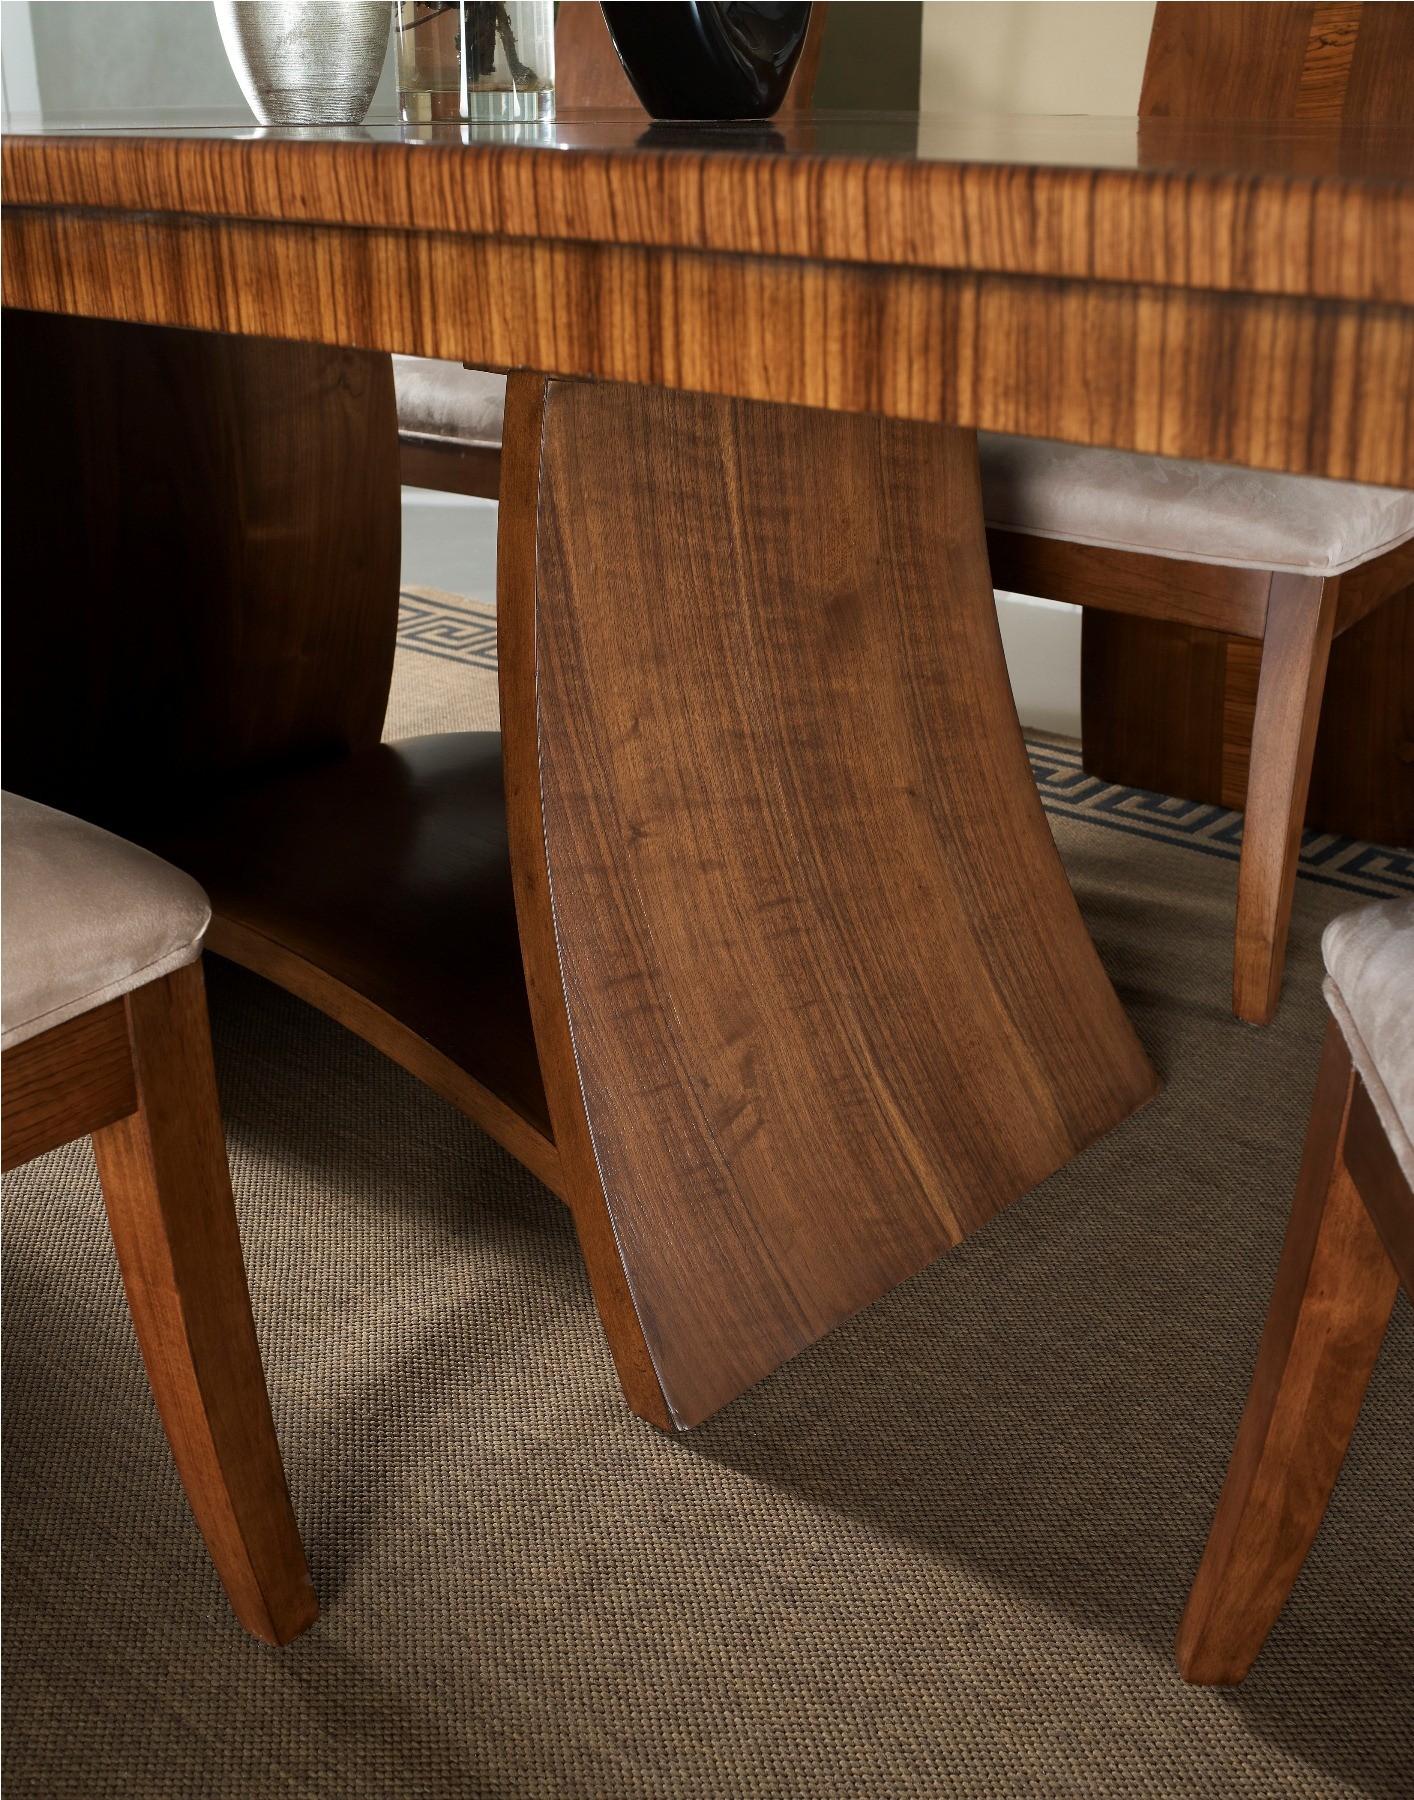 milan rectangular pedestal dining table from somerton dwelling 153 62 b t coleman furniture. Black Bedroom Furniture Sets. Home Design Ideas